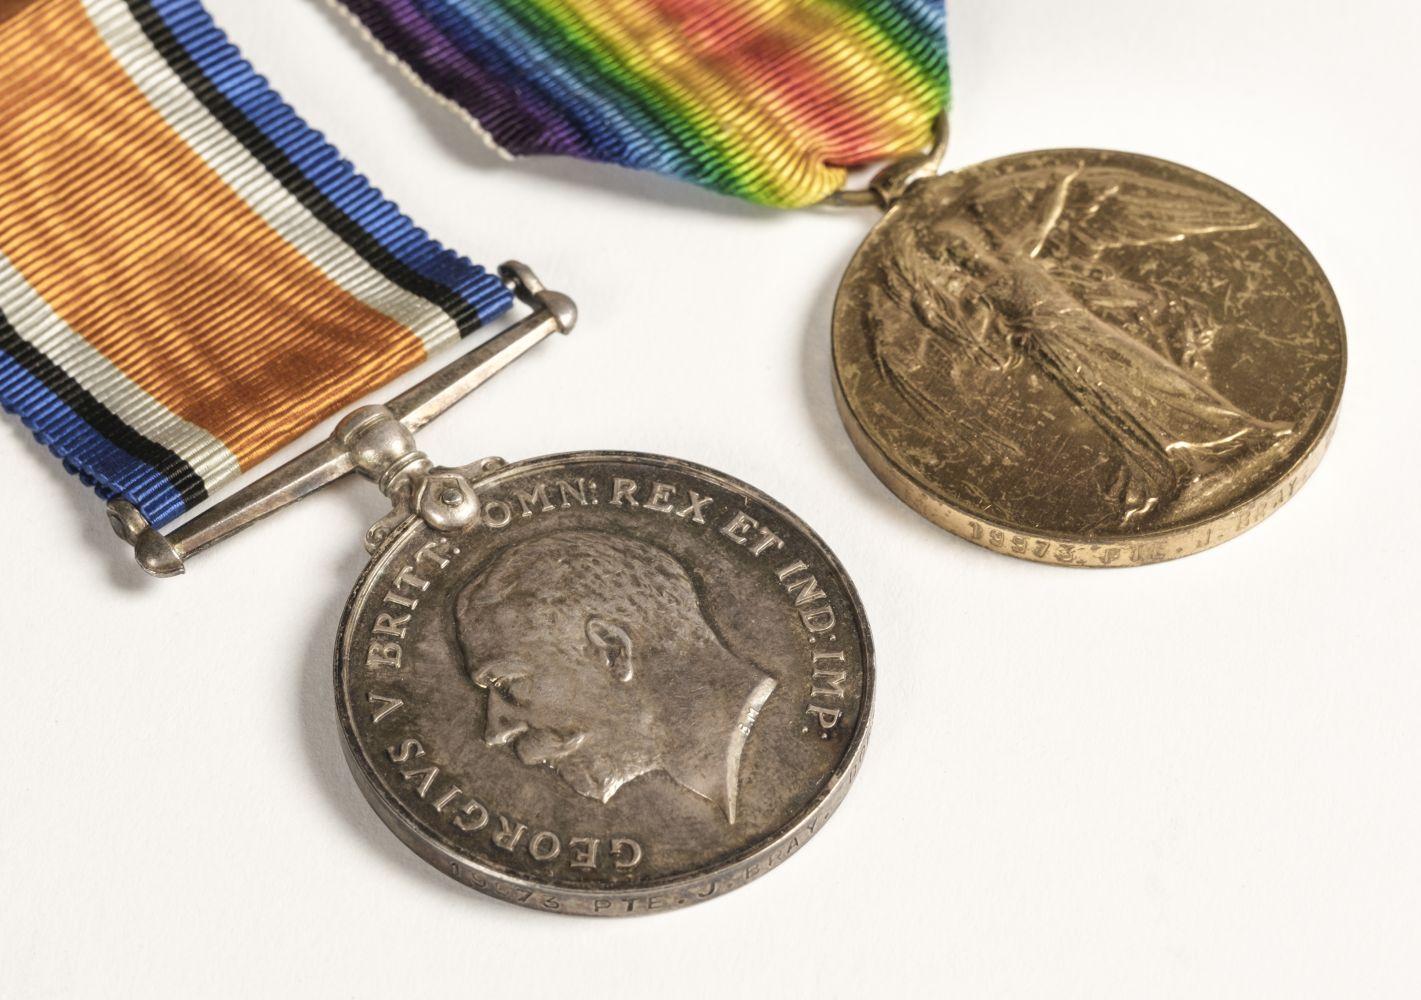 * Dorsetshire Regiment Medals & Memorial Plaque - Image 2 of 5